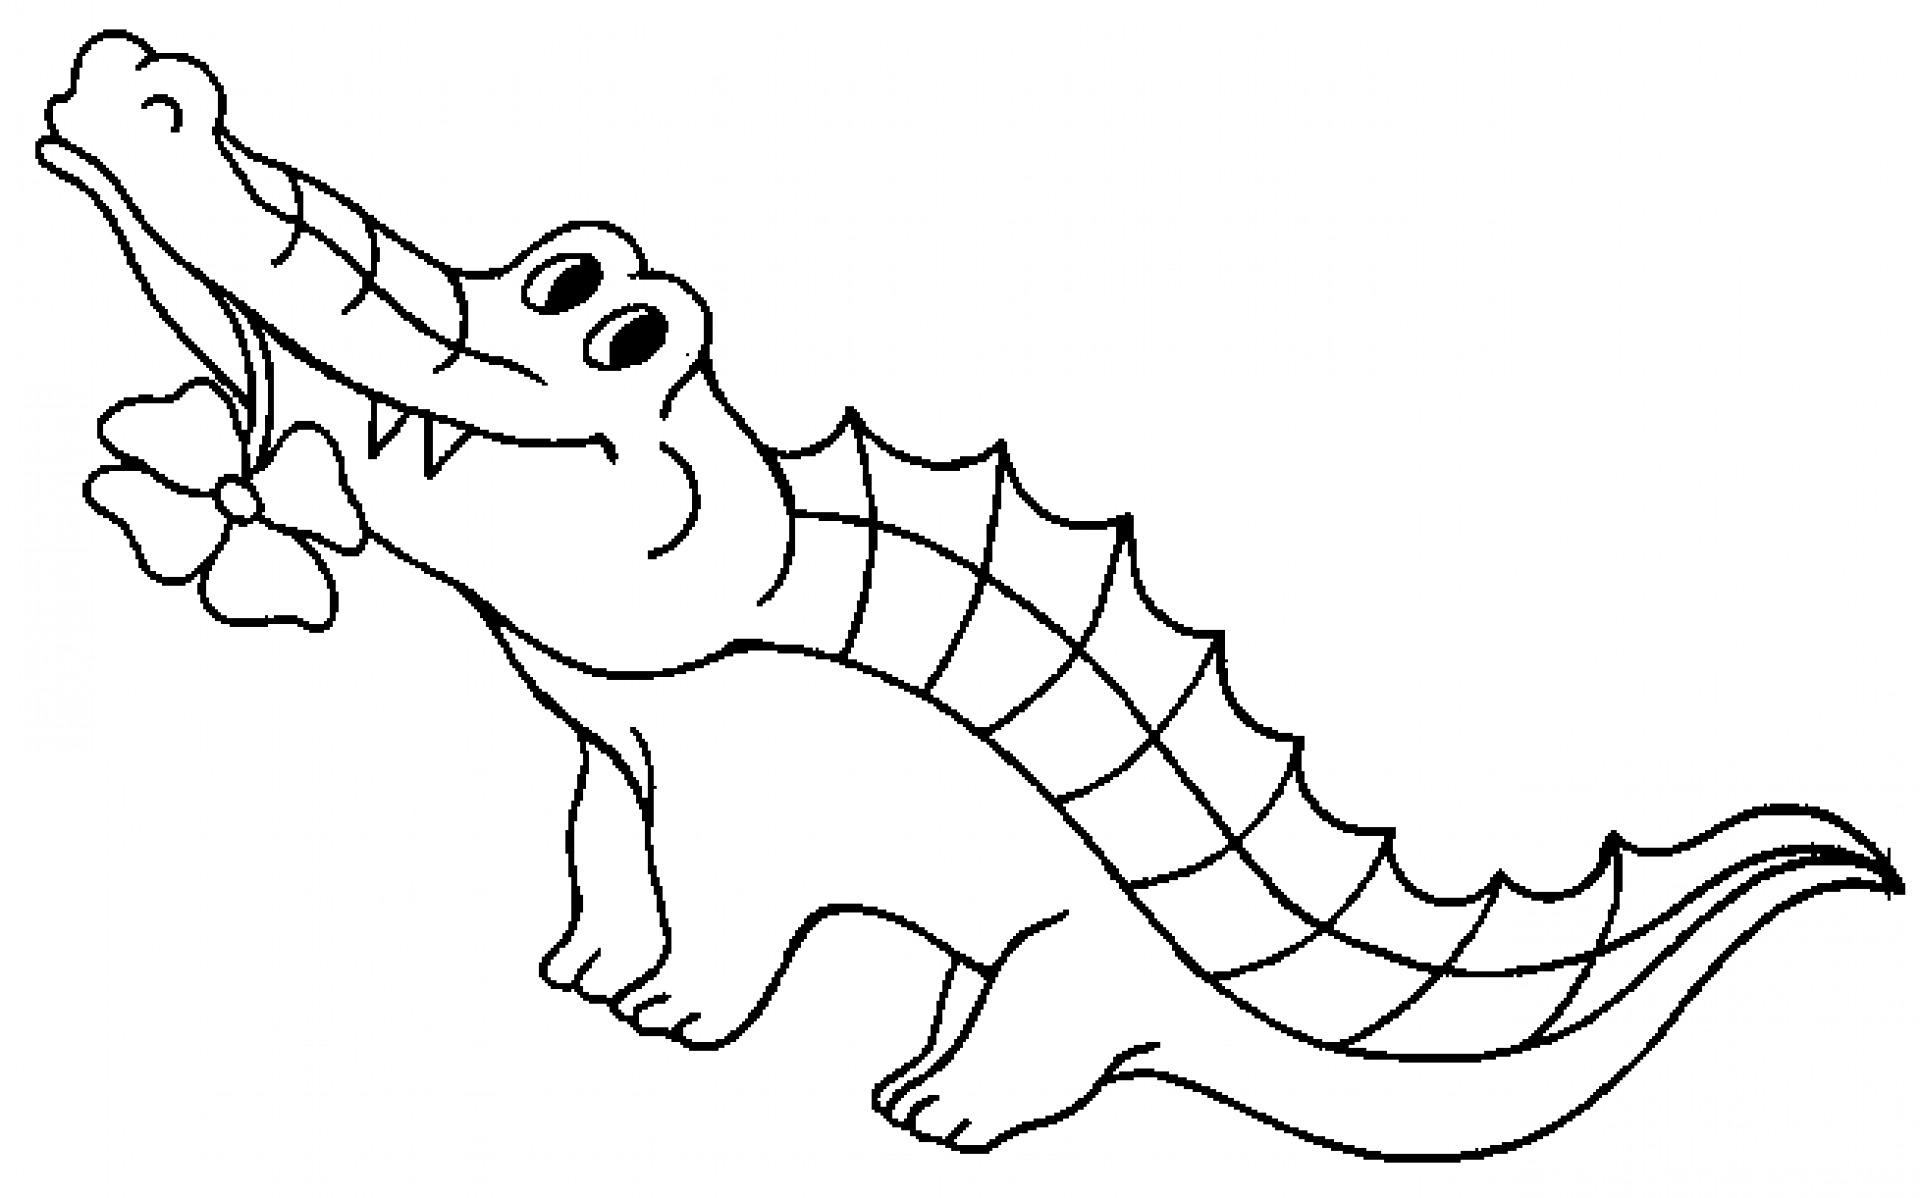 Black and white clipart alligator stock Clipart alligator black and white 4 » Clipart Station stock